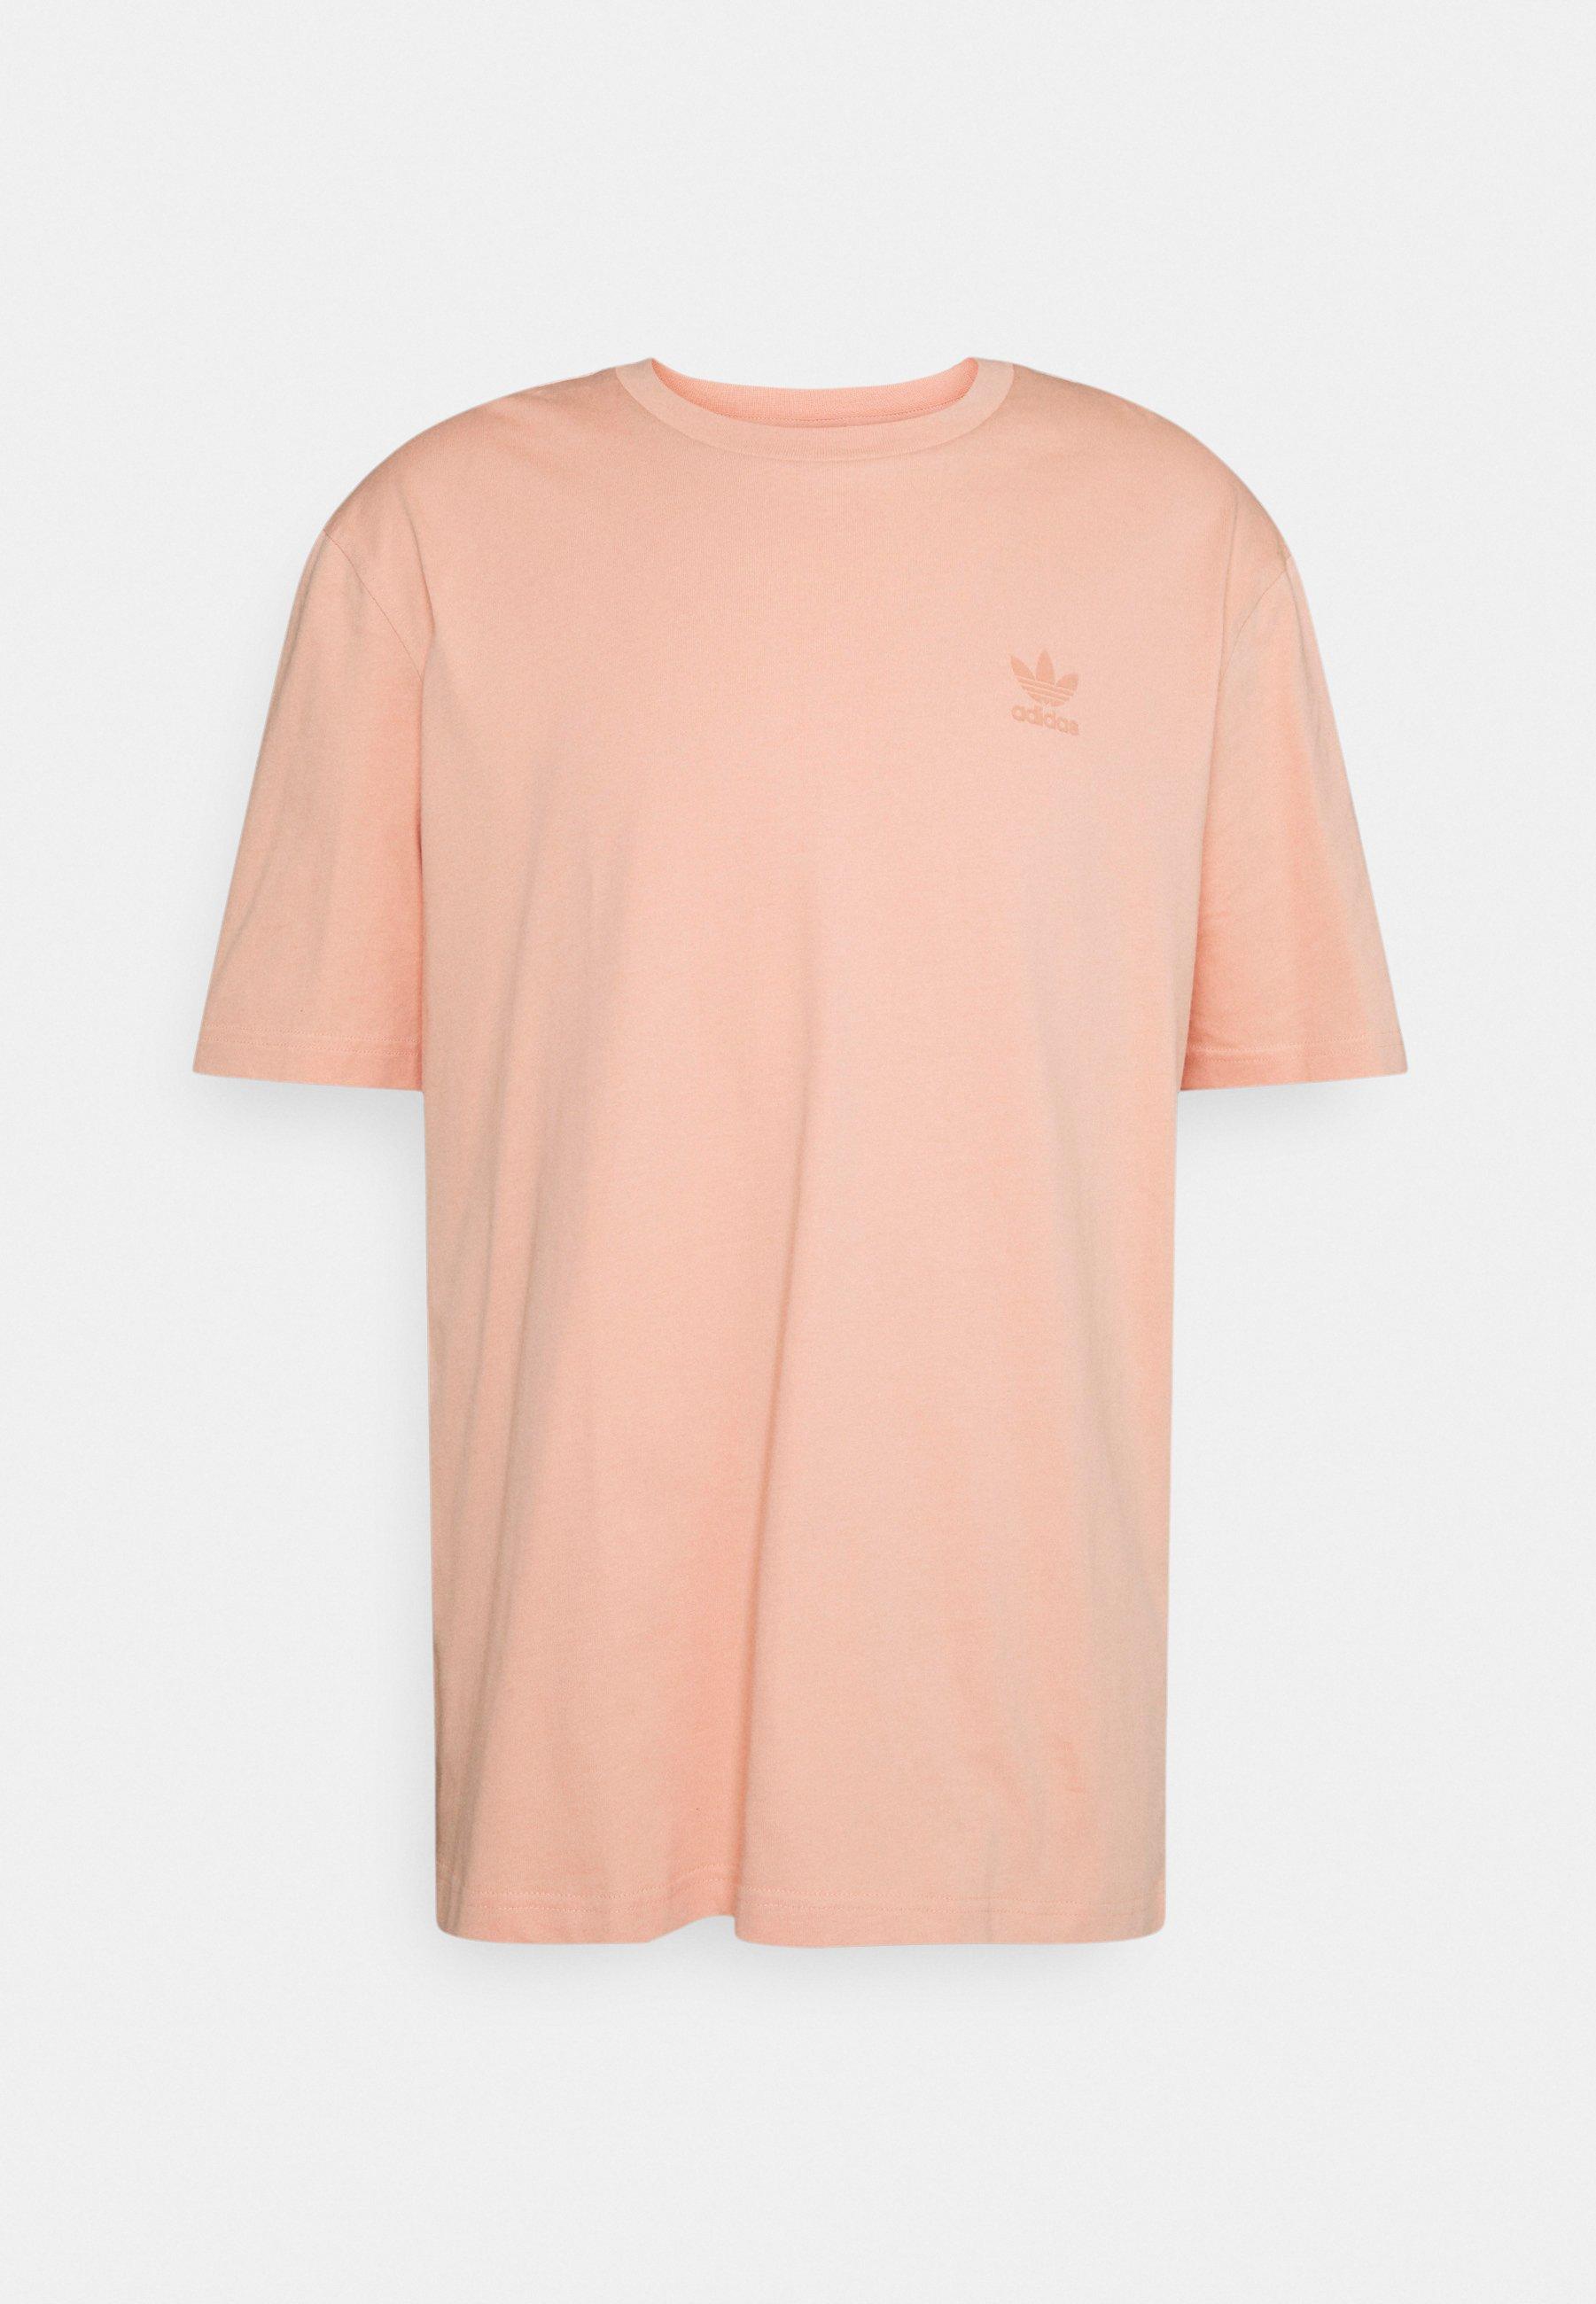 Uomo TEE UNISEX - T-shirt con stampa